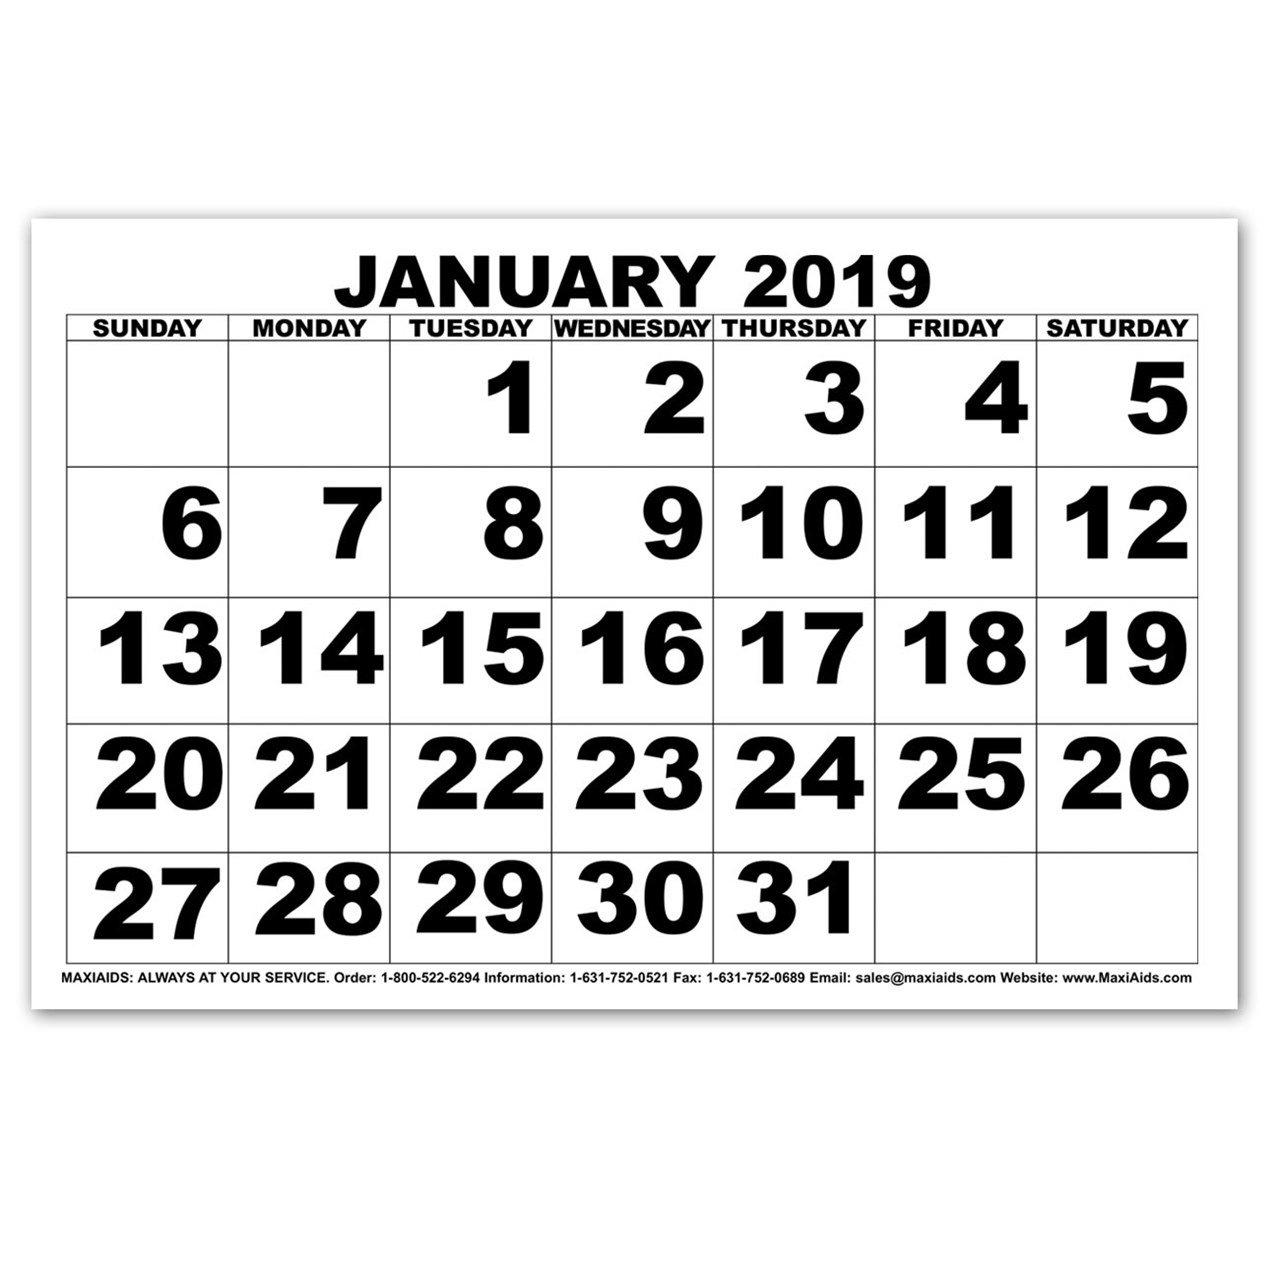 Maxiaids | Low Vision Print Calendar - 2019 Calendar 2019 Small